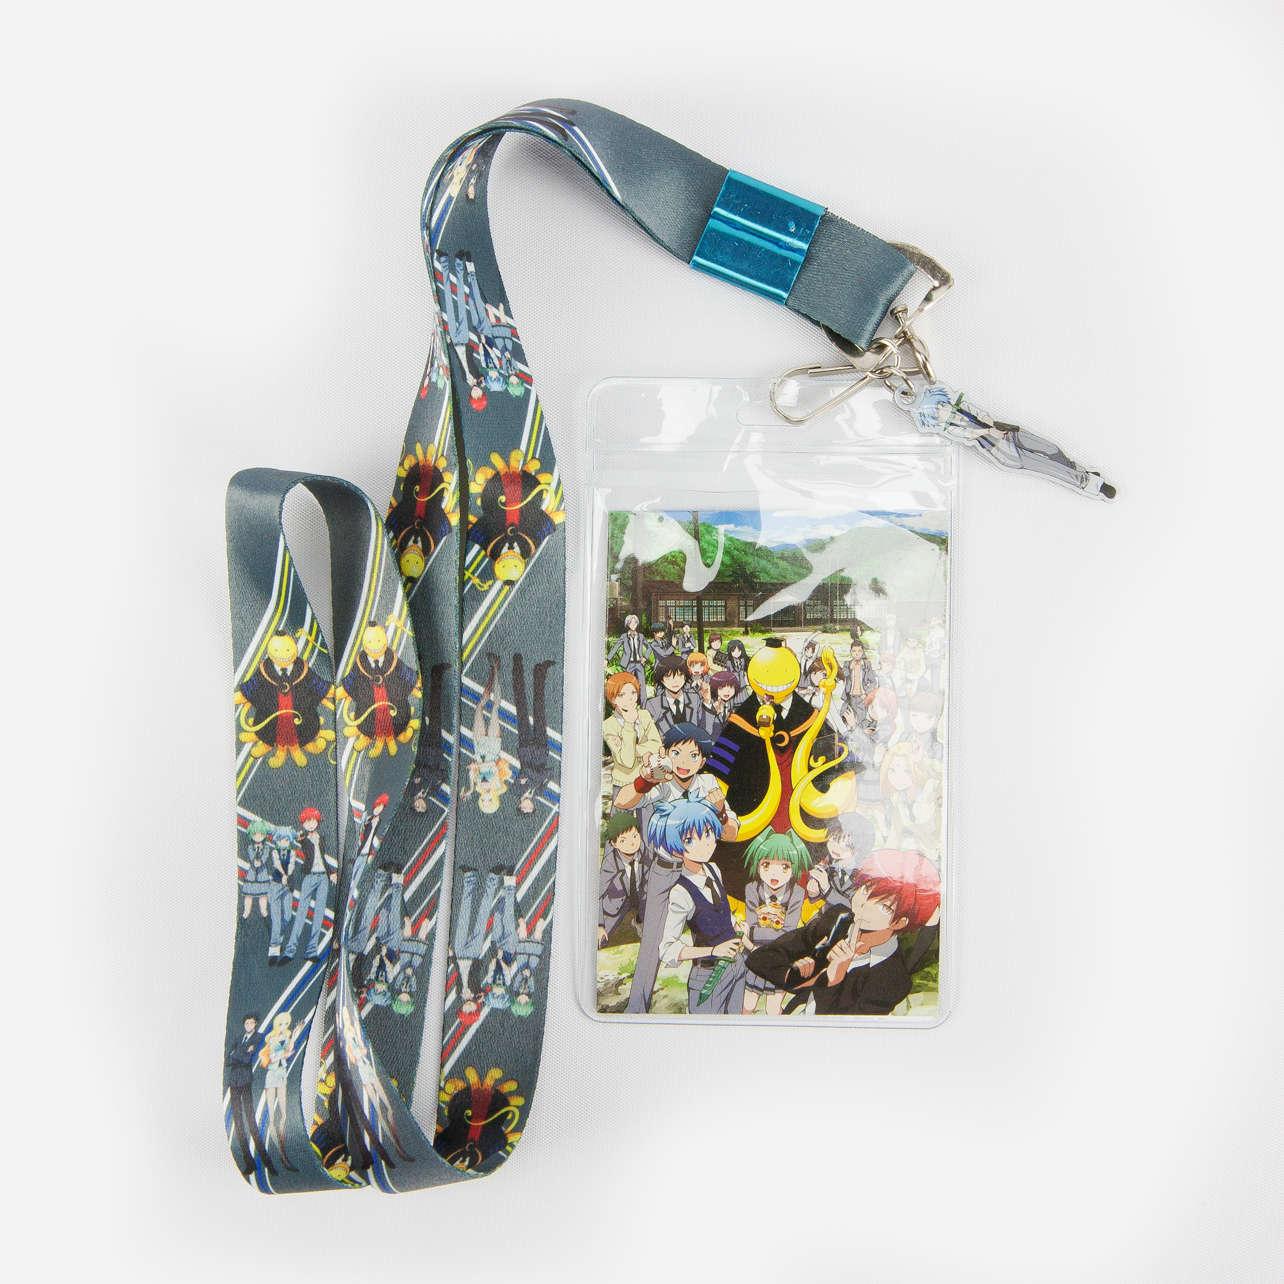 Lanyard accessories